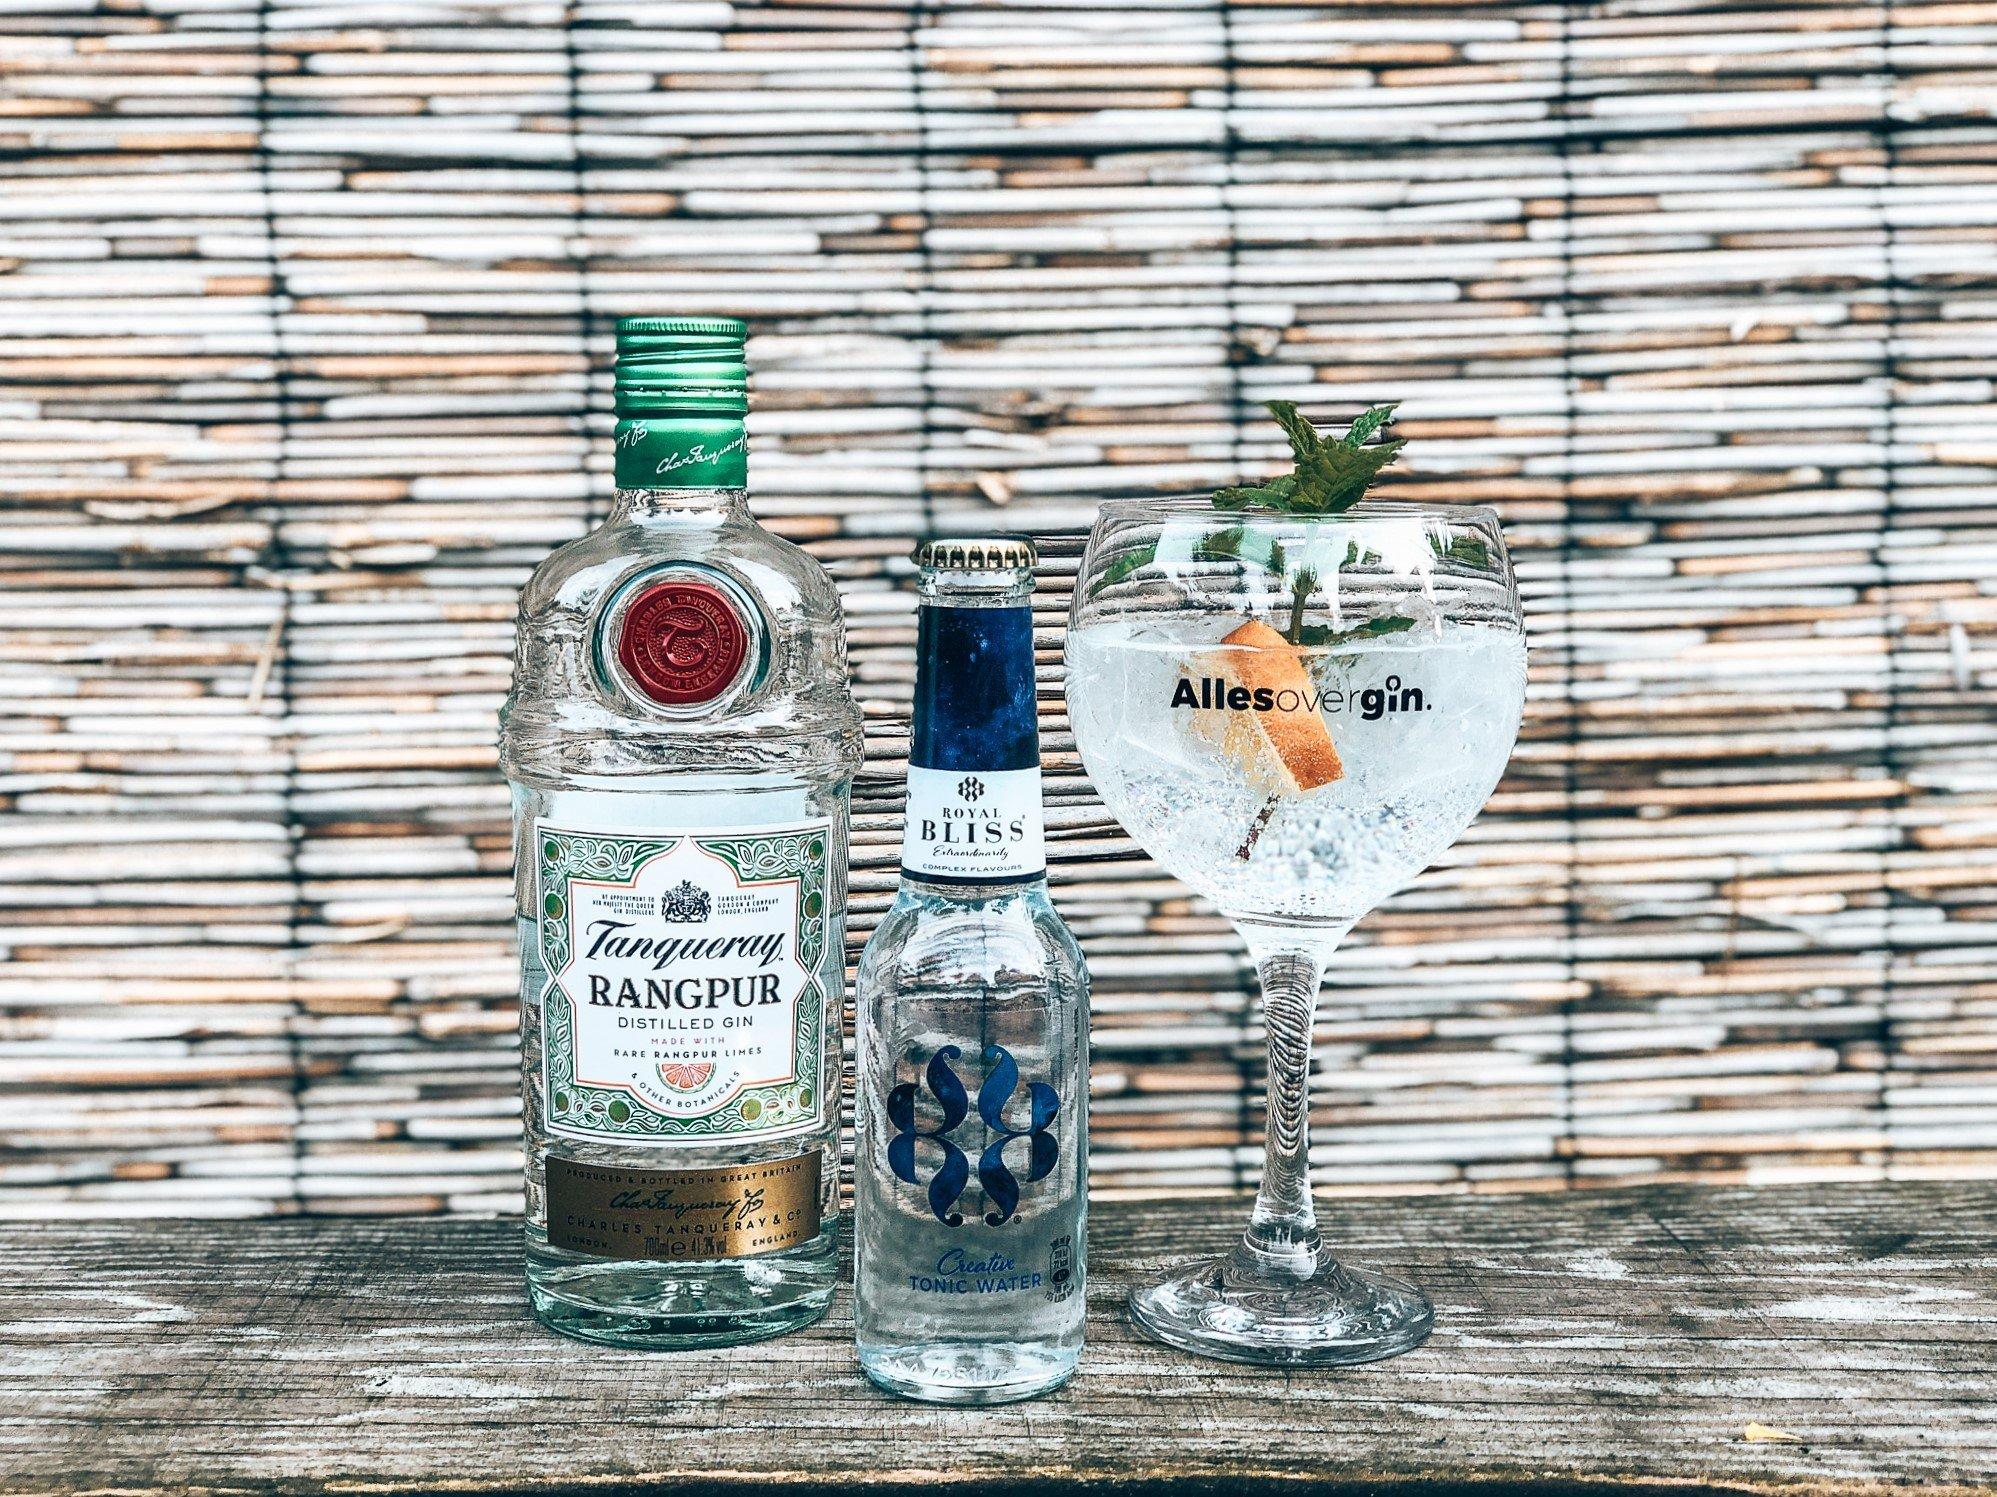 Orangepur van Tanqueray Rangpur en Royal Bliss Creative Tonic Water, Alles over gin.